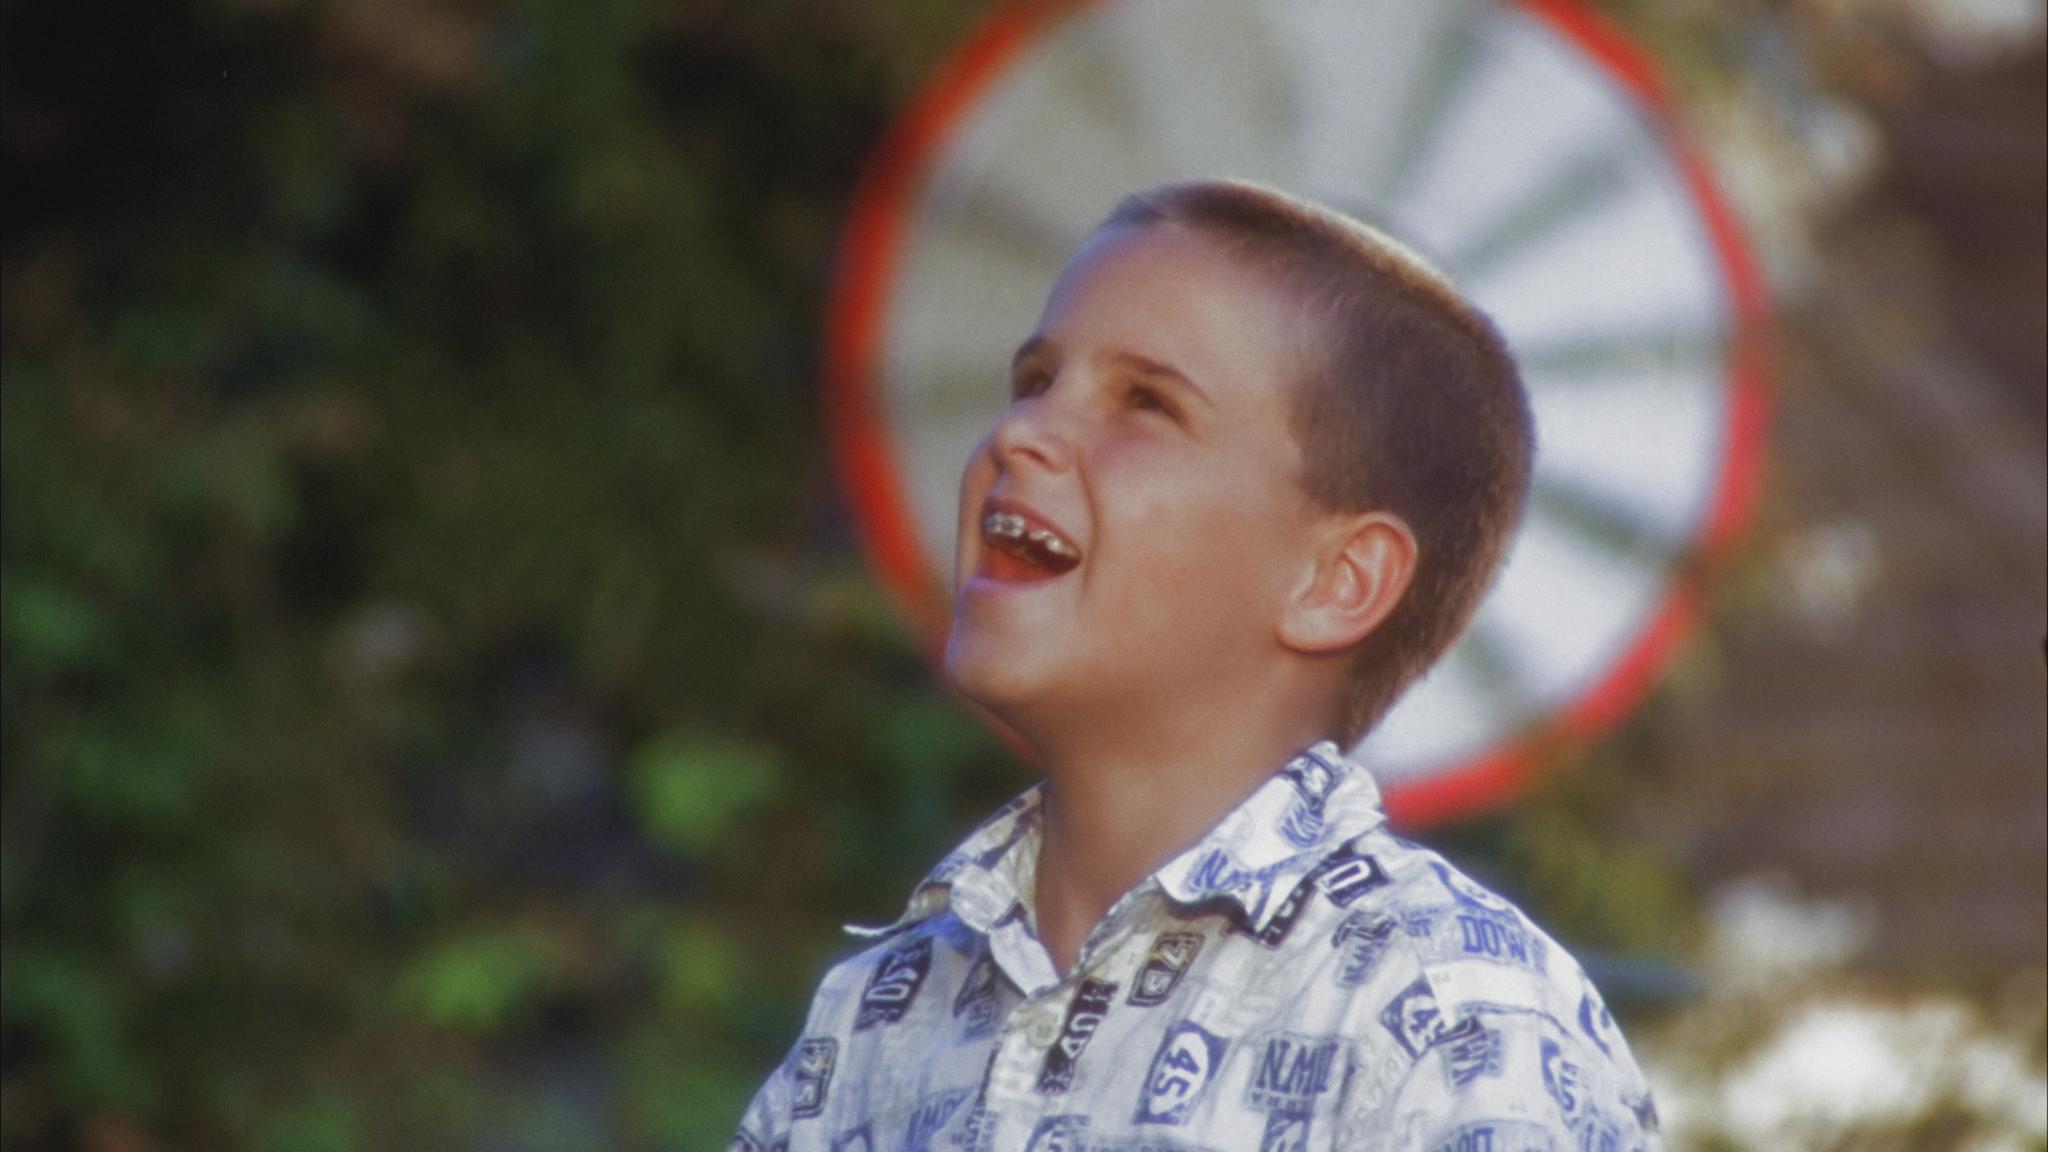 Kevin DeSimone (Age 10)